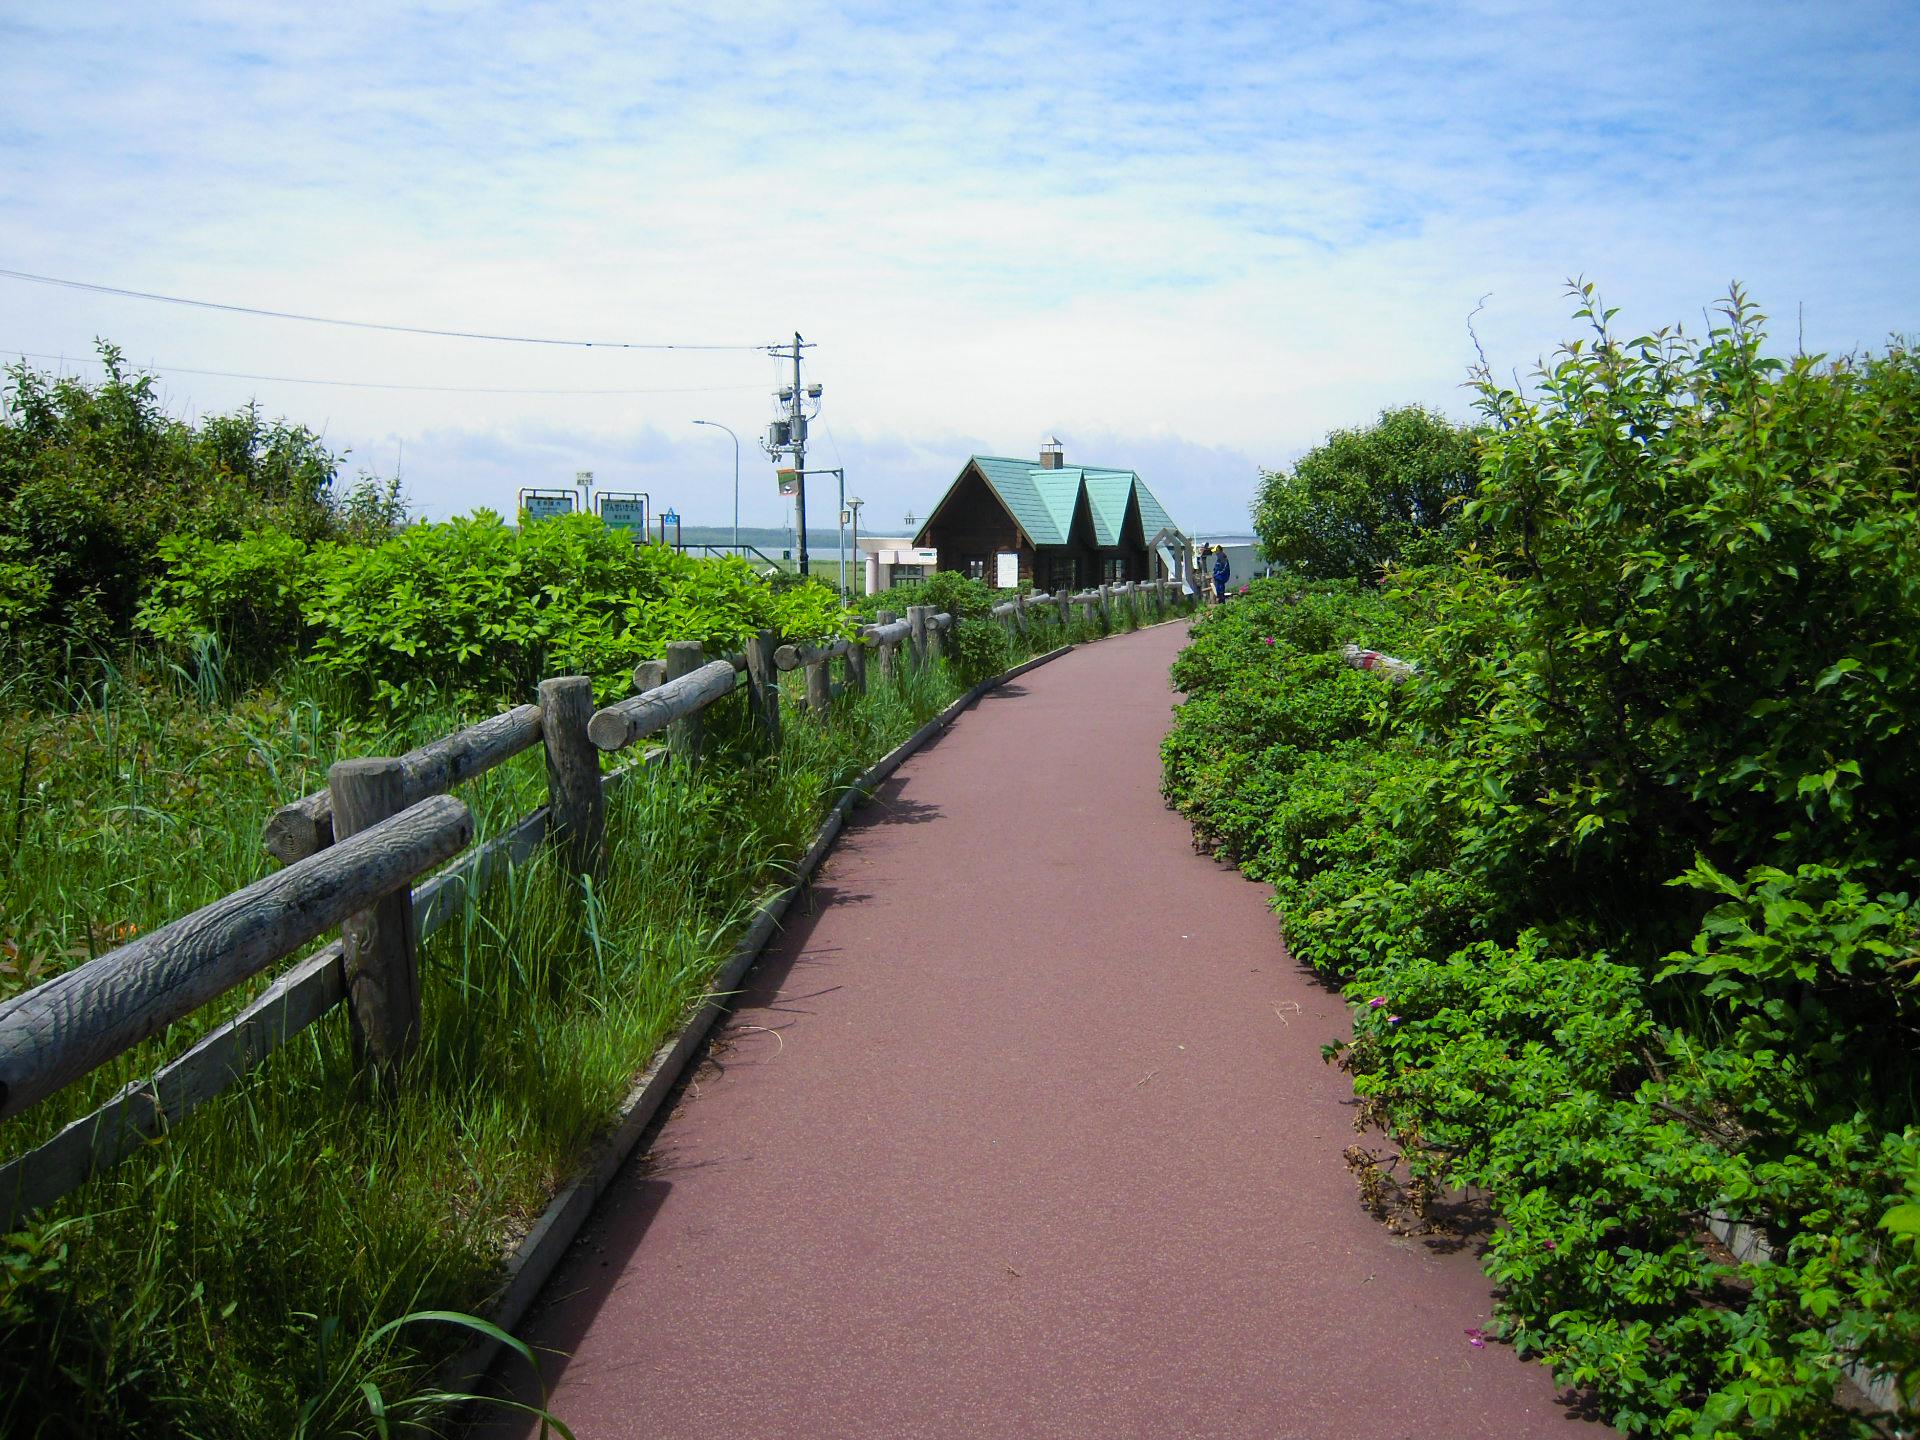 小清水原生花園の遊歩道